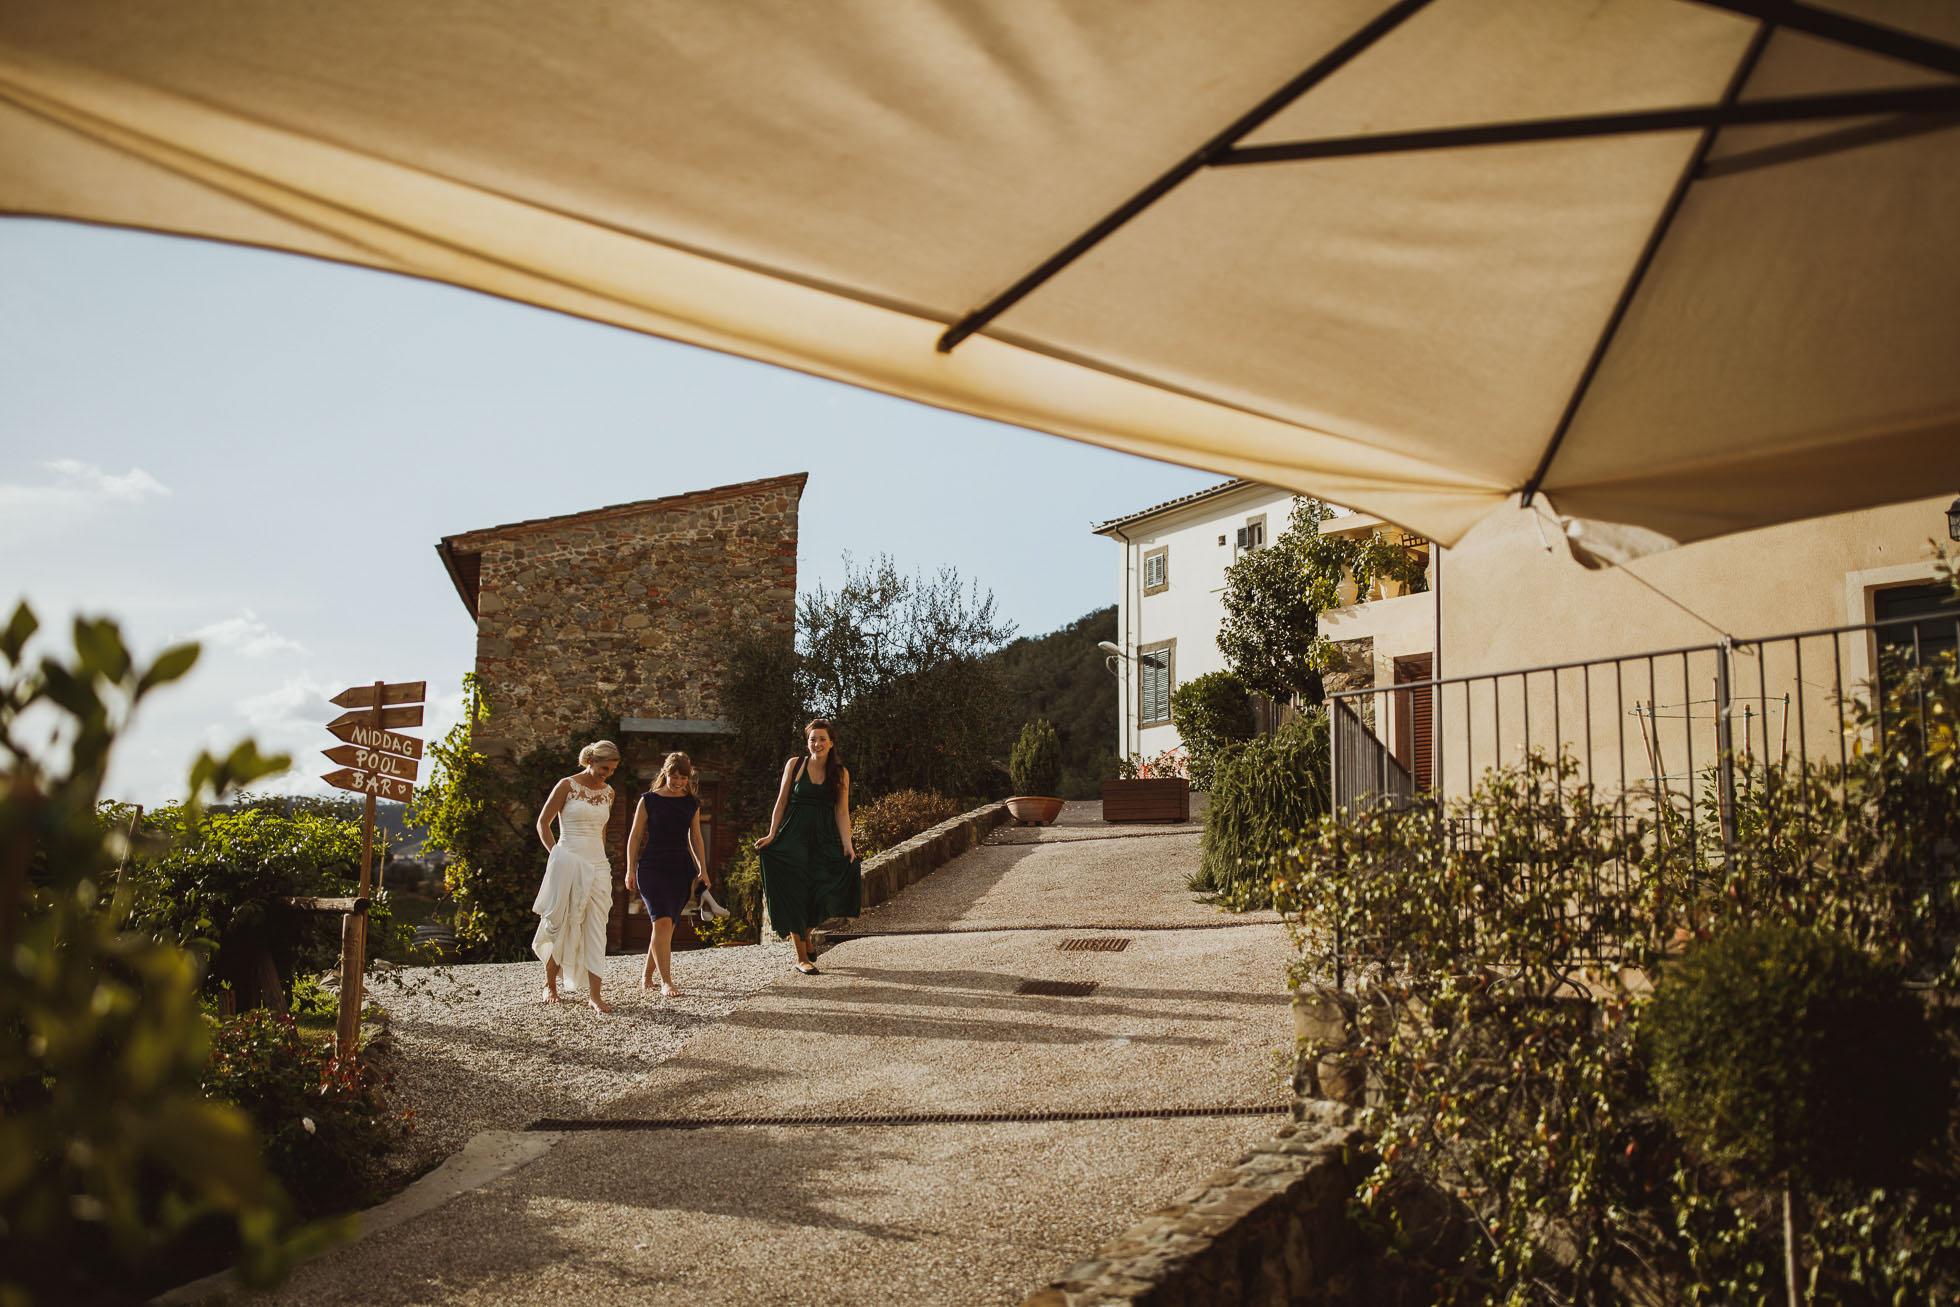 tenuta_san_pietro_wedding_photographer-59.jpg